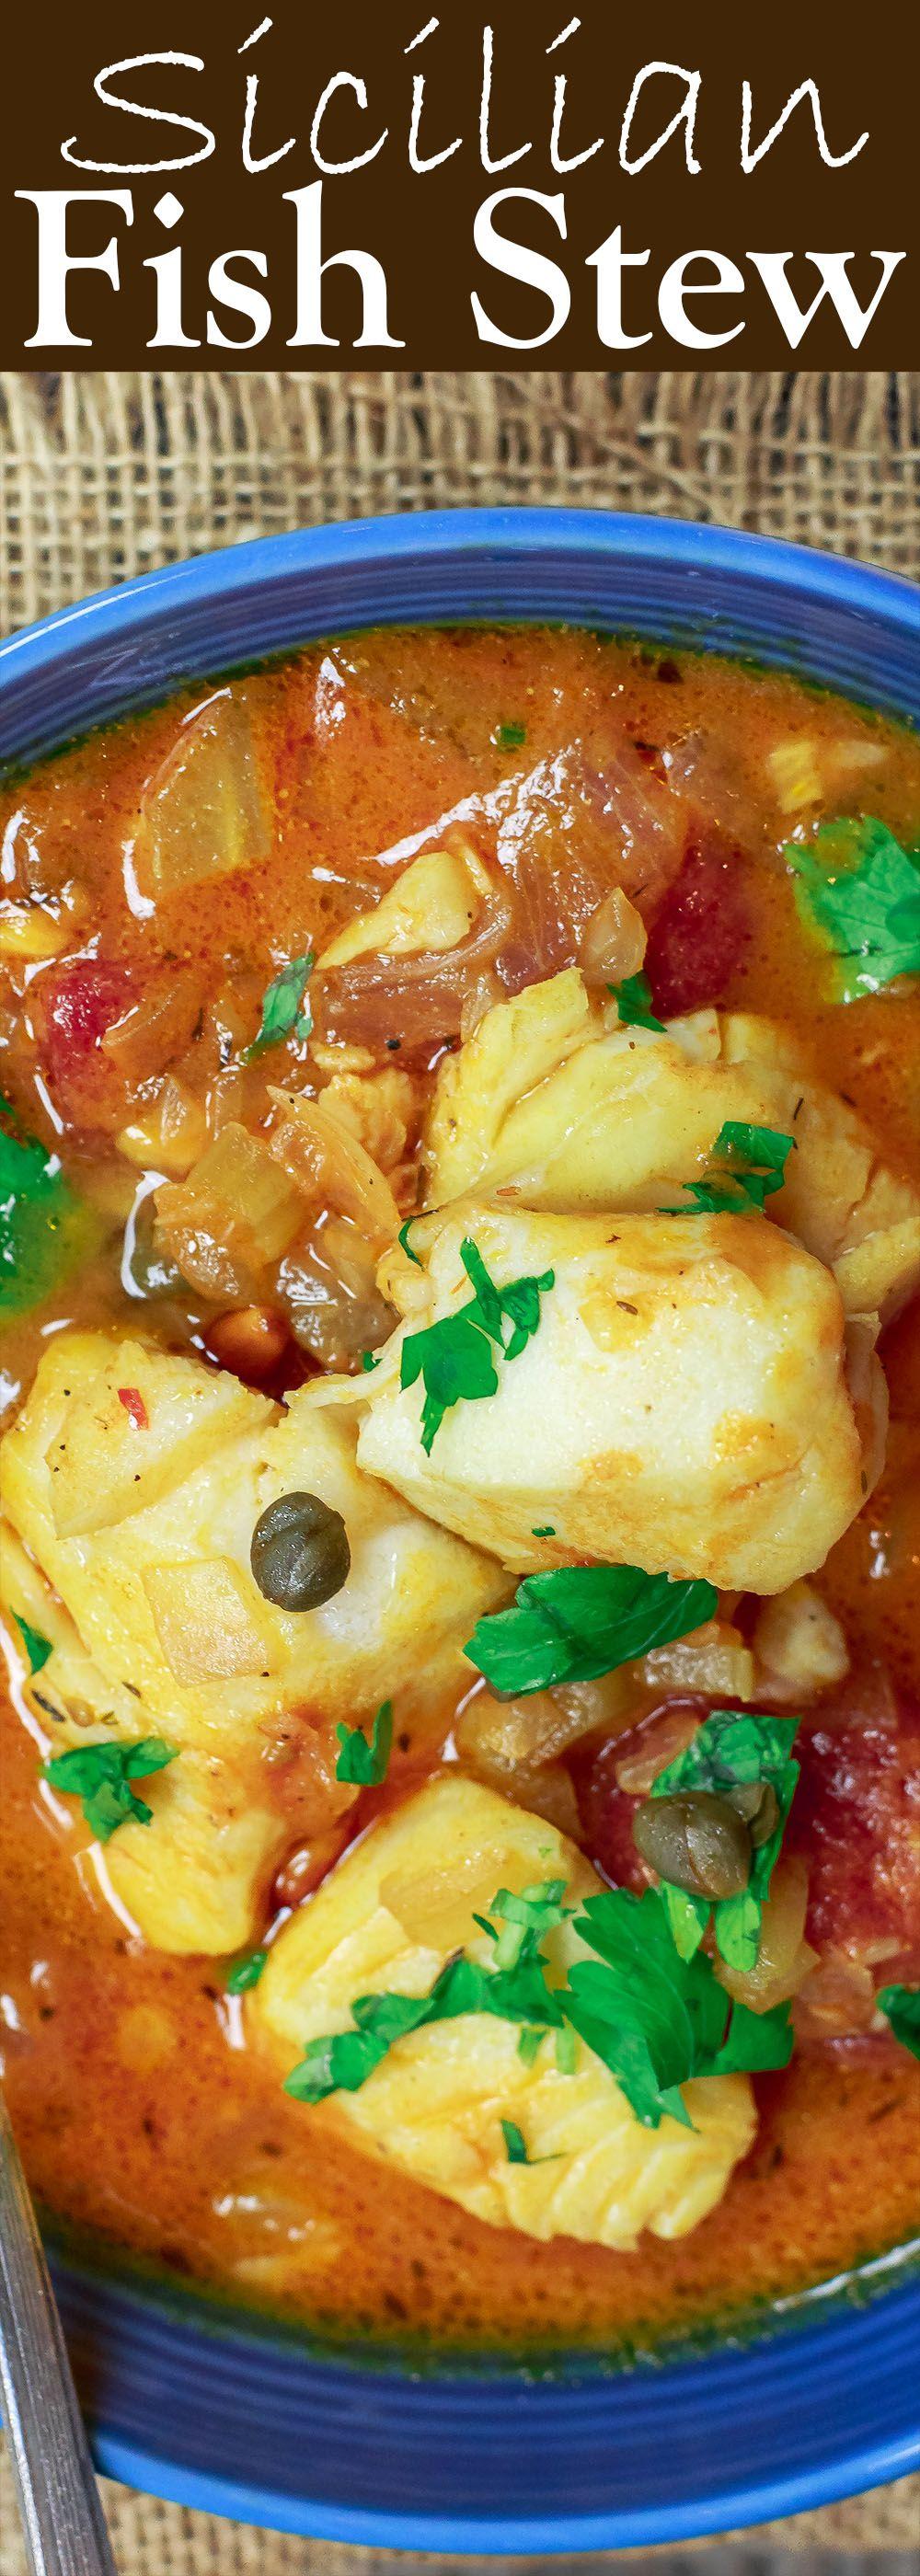 Sicilian-Style Fish Stew Recipe | The Mediterranean Dish